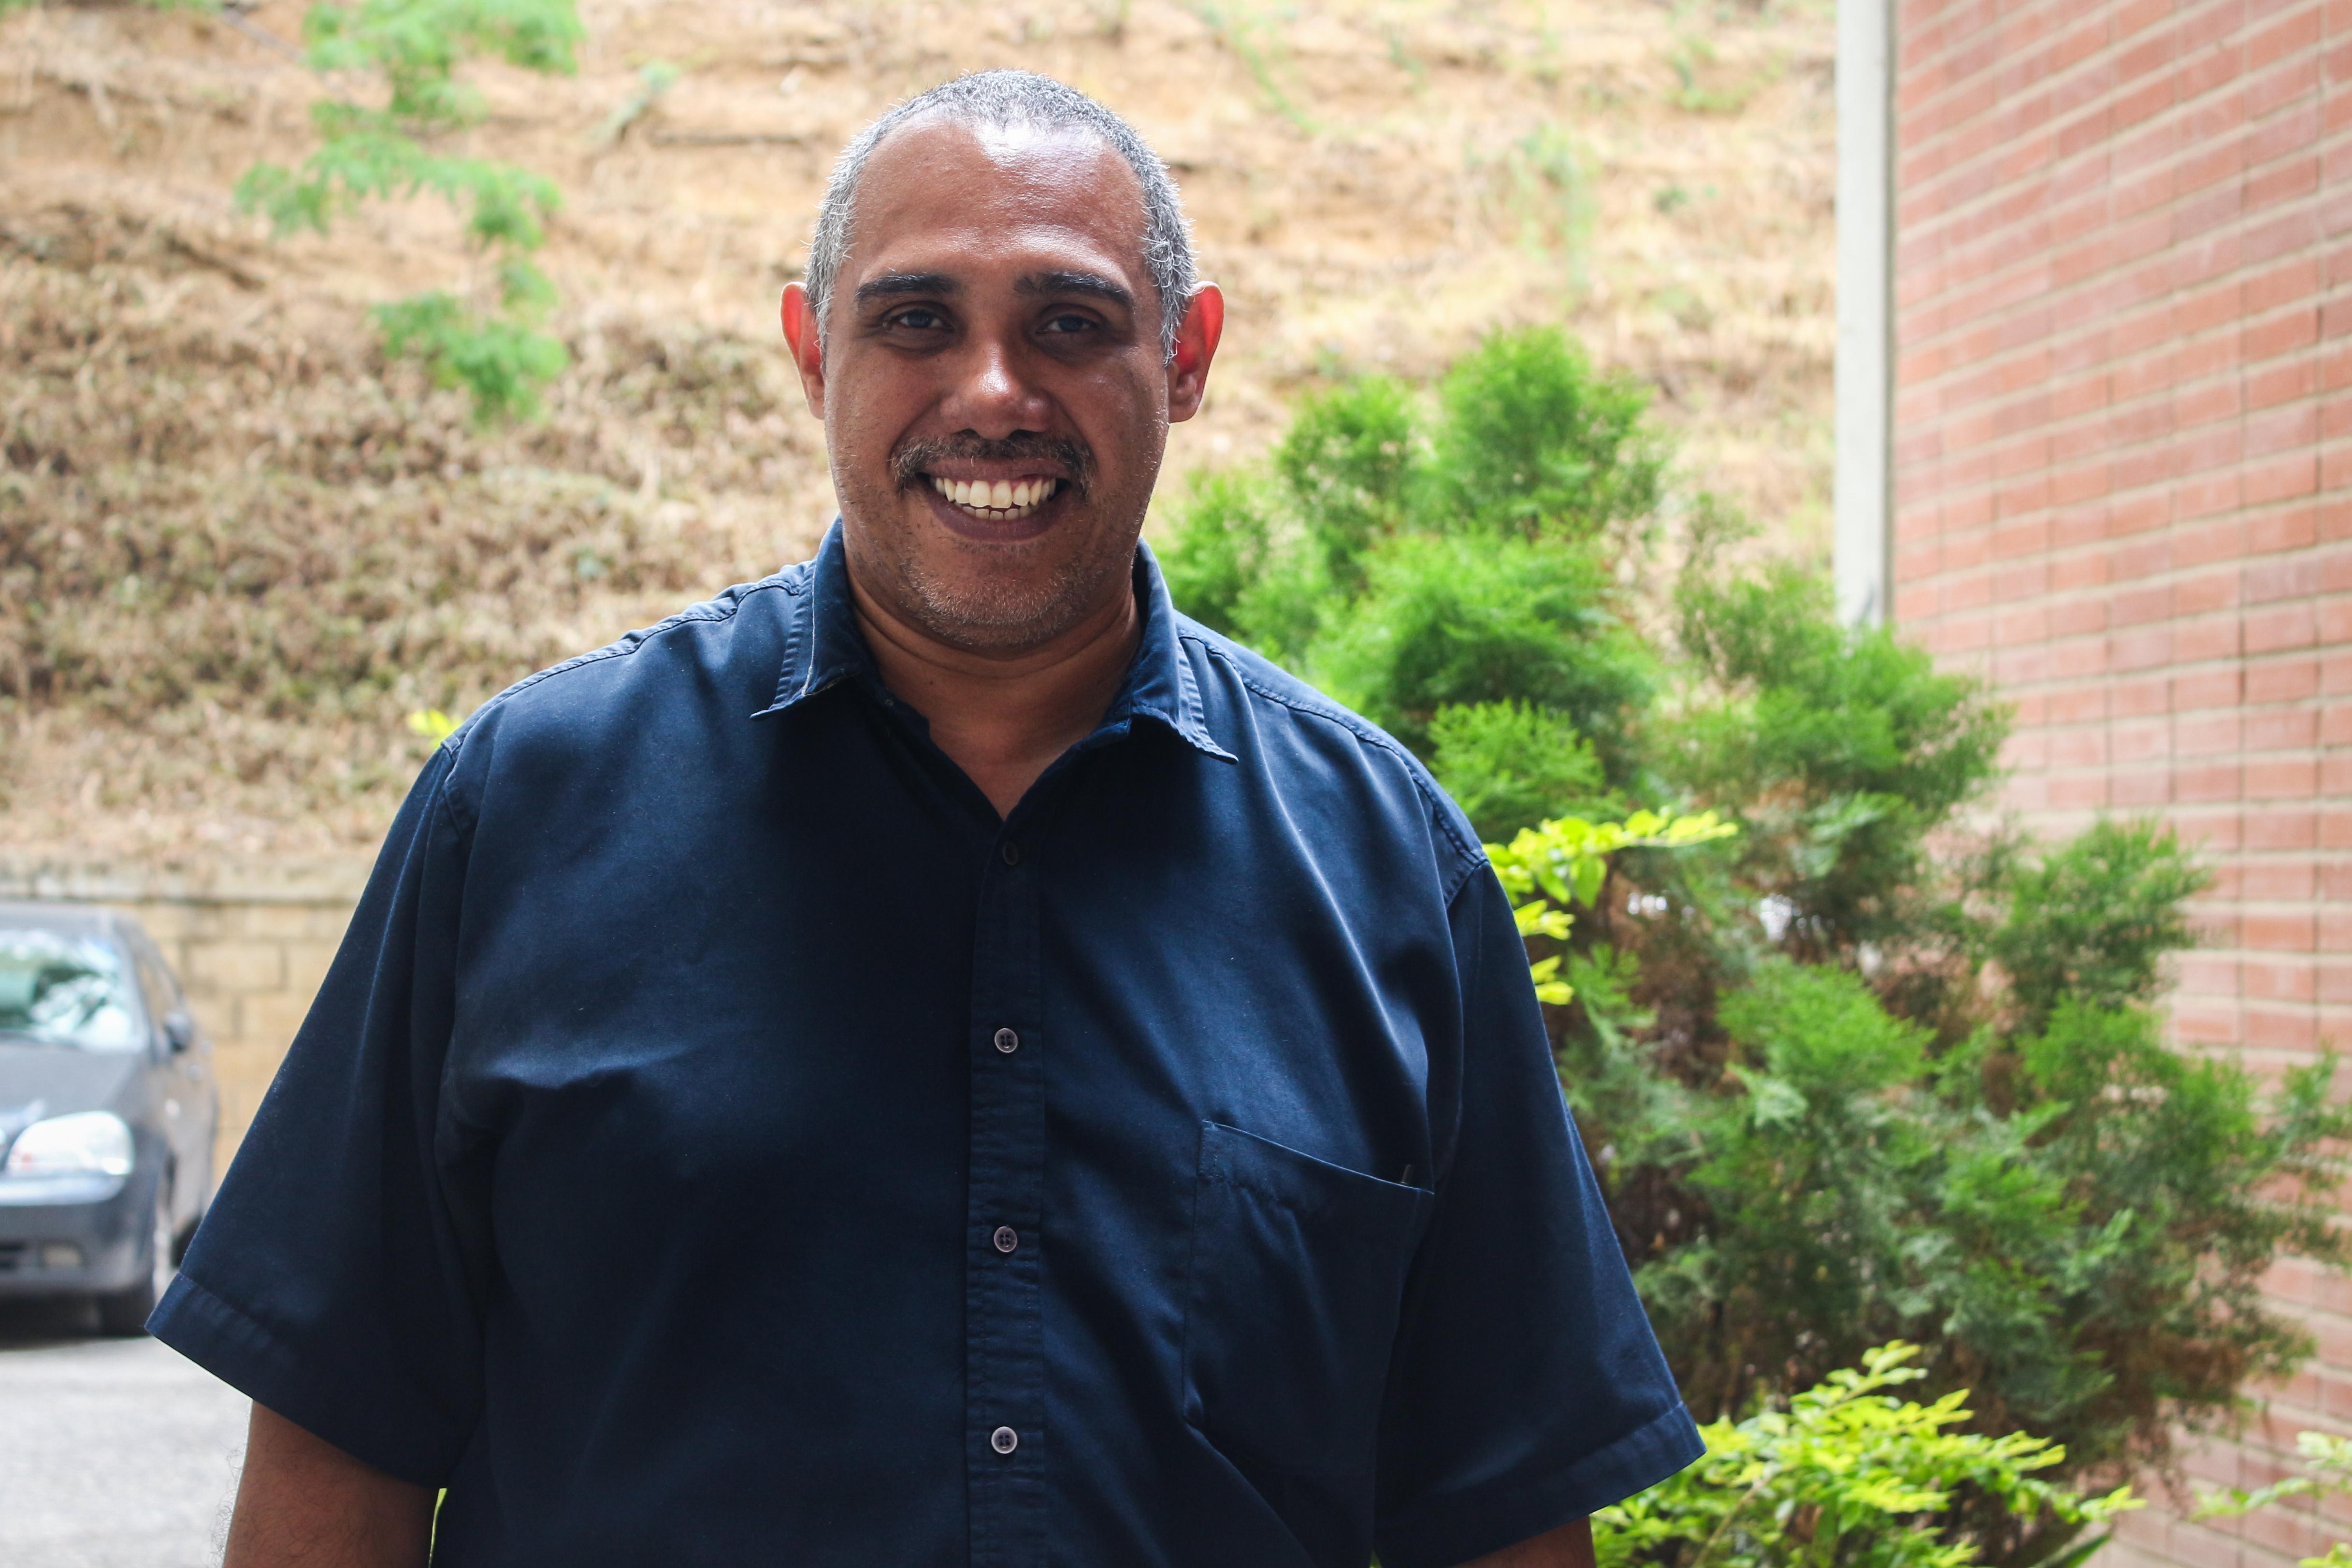 Profesores que inspiran: Henry Martínez